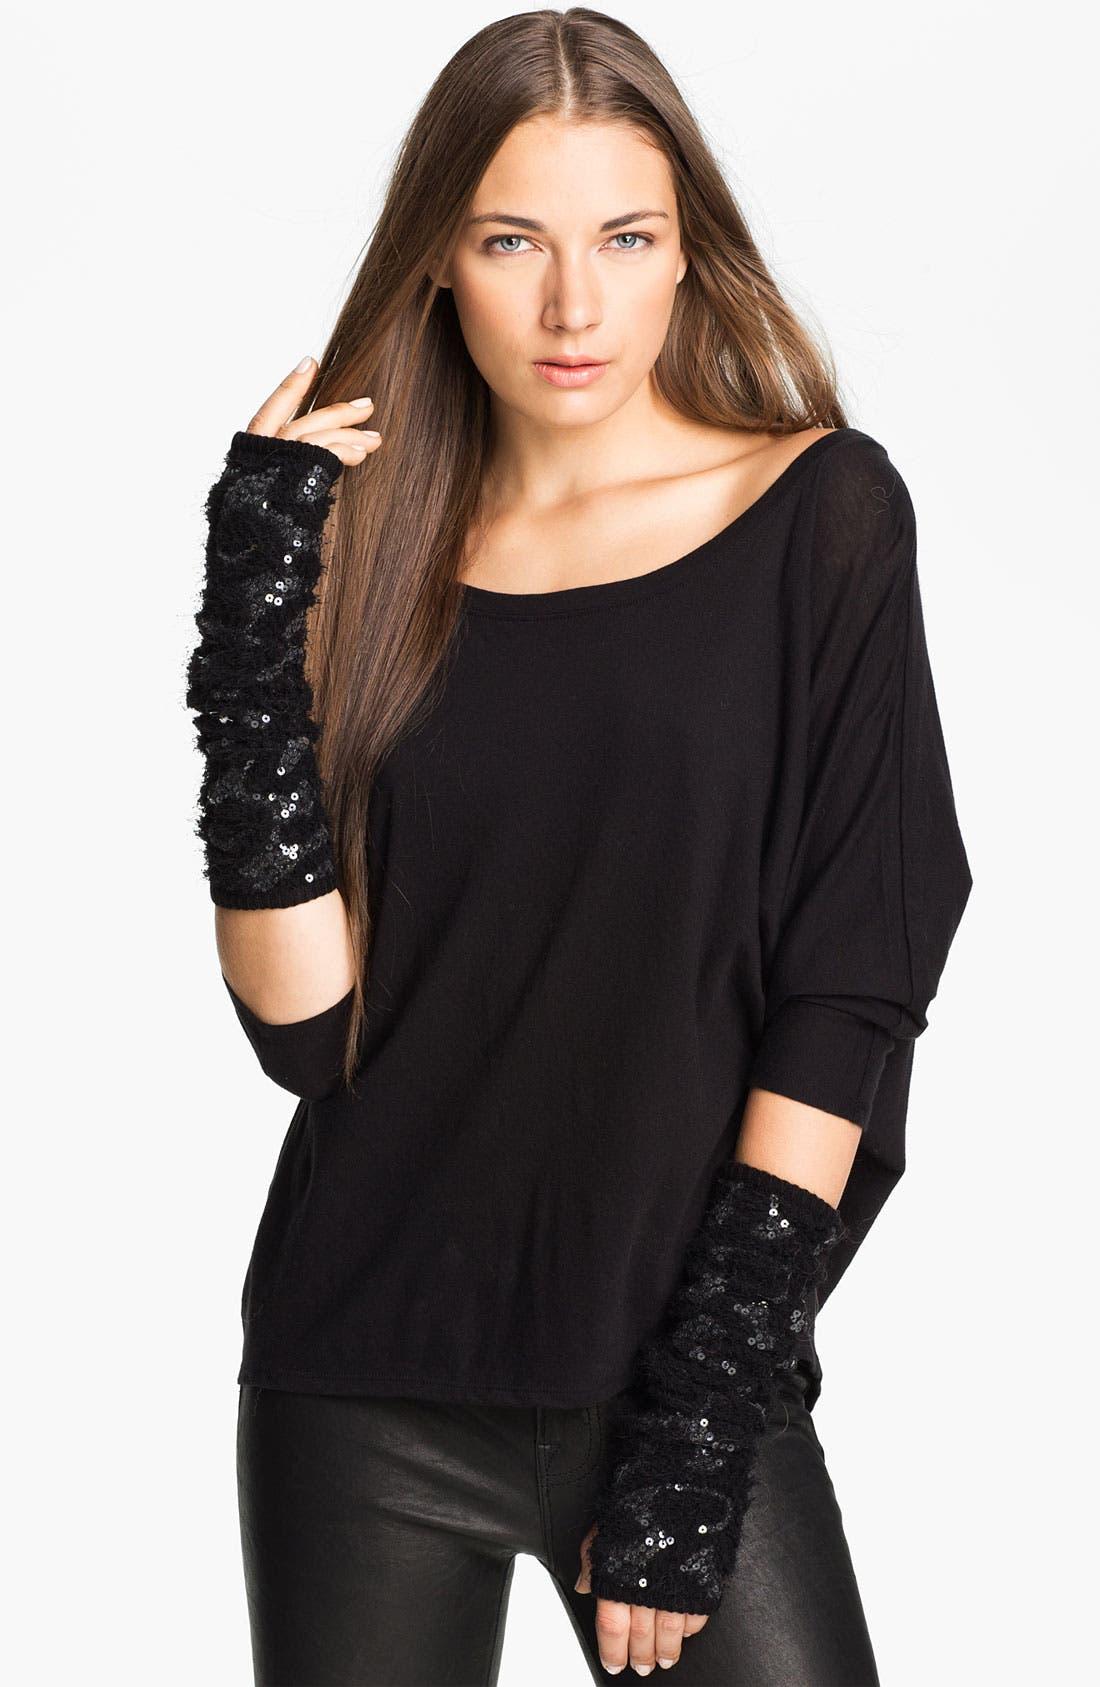 Alternate Image 1 Selected - Rachel Zoe Stretch Sequin Arm Warmers